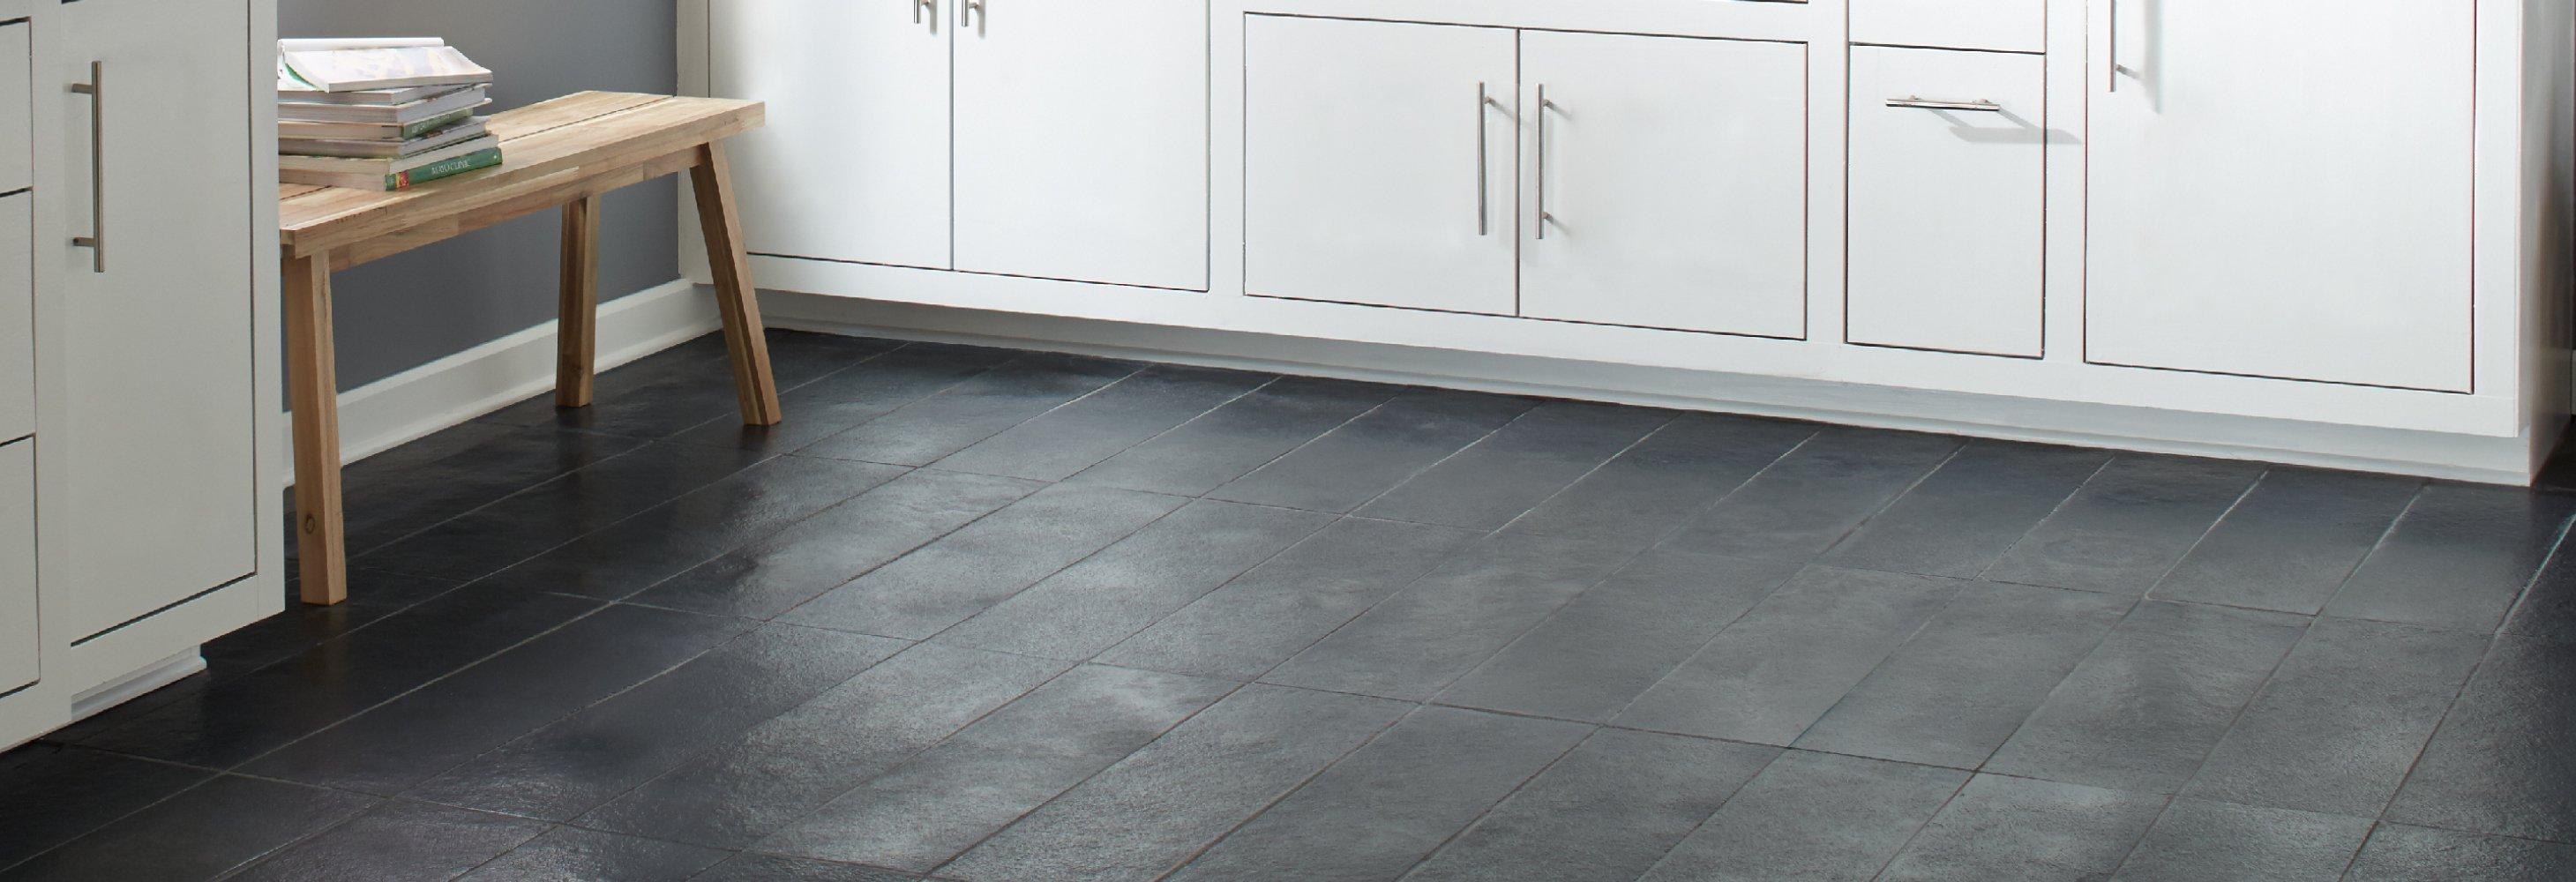 Kitchen Stone Floor Decor